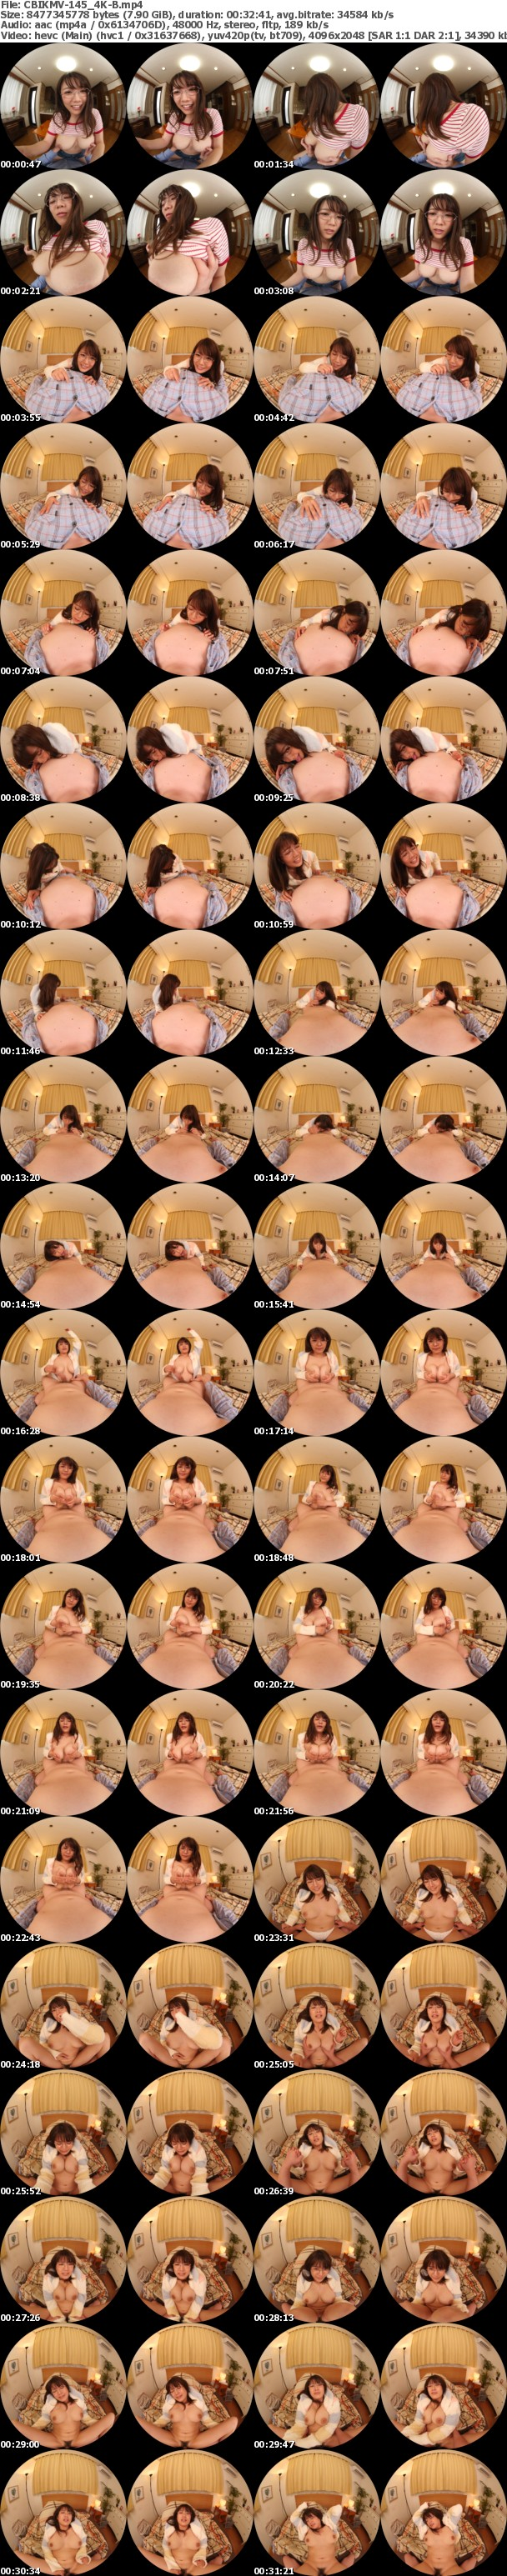 (VR) (4K) CBIKMV-145 昔からおっぱいデカ過ぎオレの嫁ちゃん 毎日が孕ませ生性交 夢の中出し新婚生活 佐知子